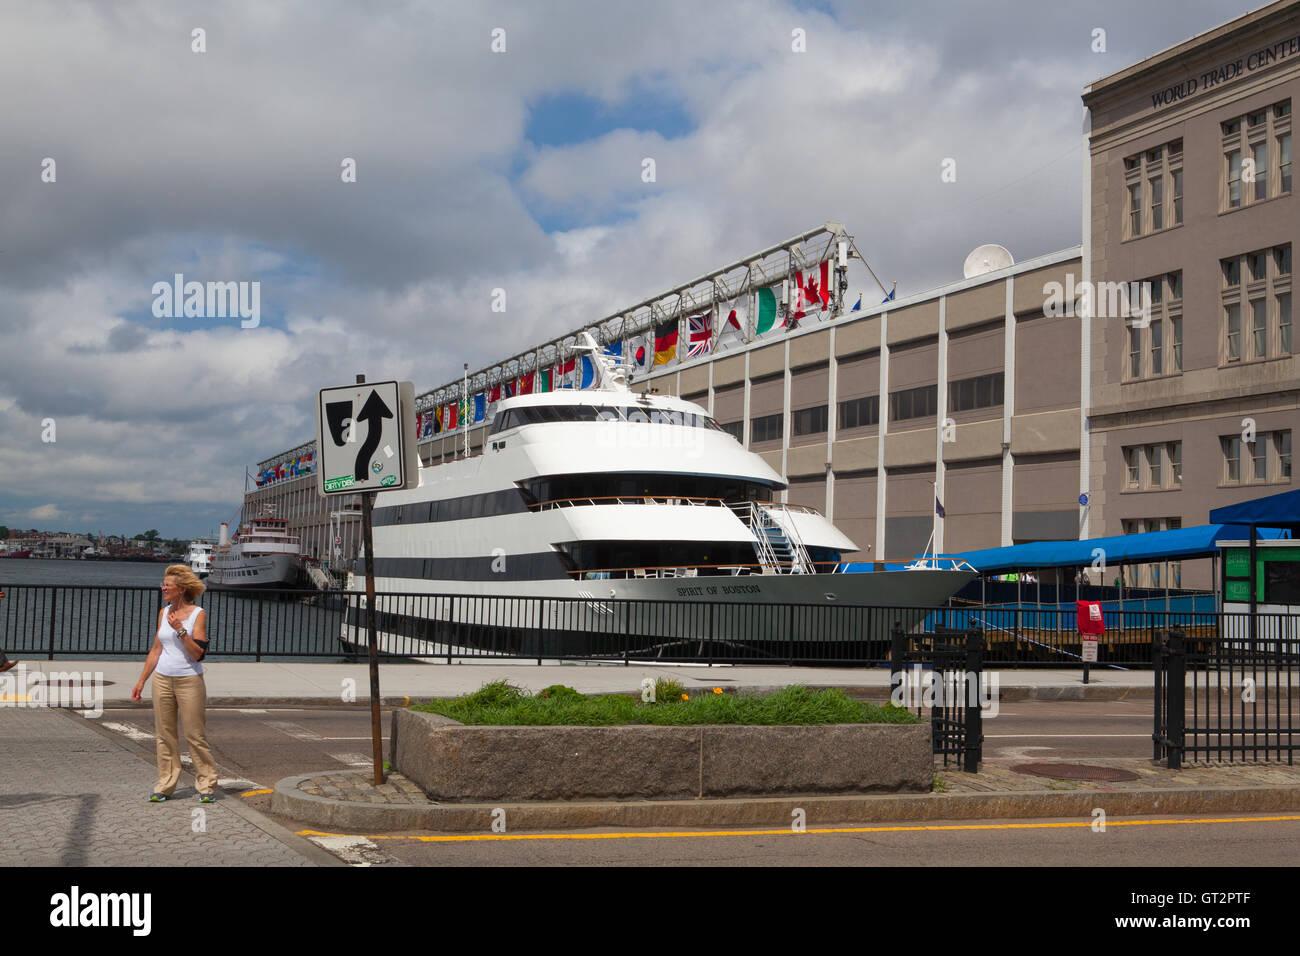 Boston,Massachussetts,USA - July 14,2016:Tourist ship in harbor. Boston tourism annually brings about 8 billion - Stock Image